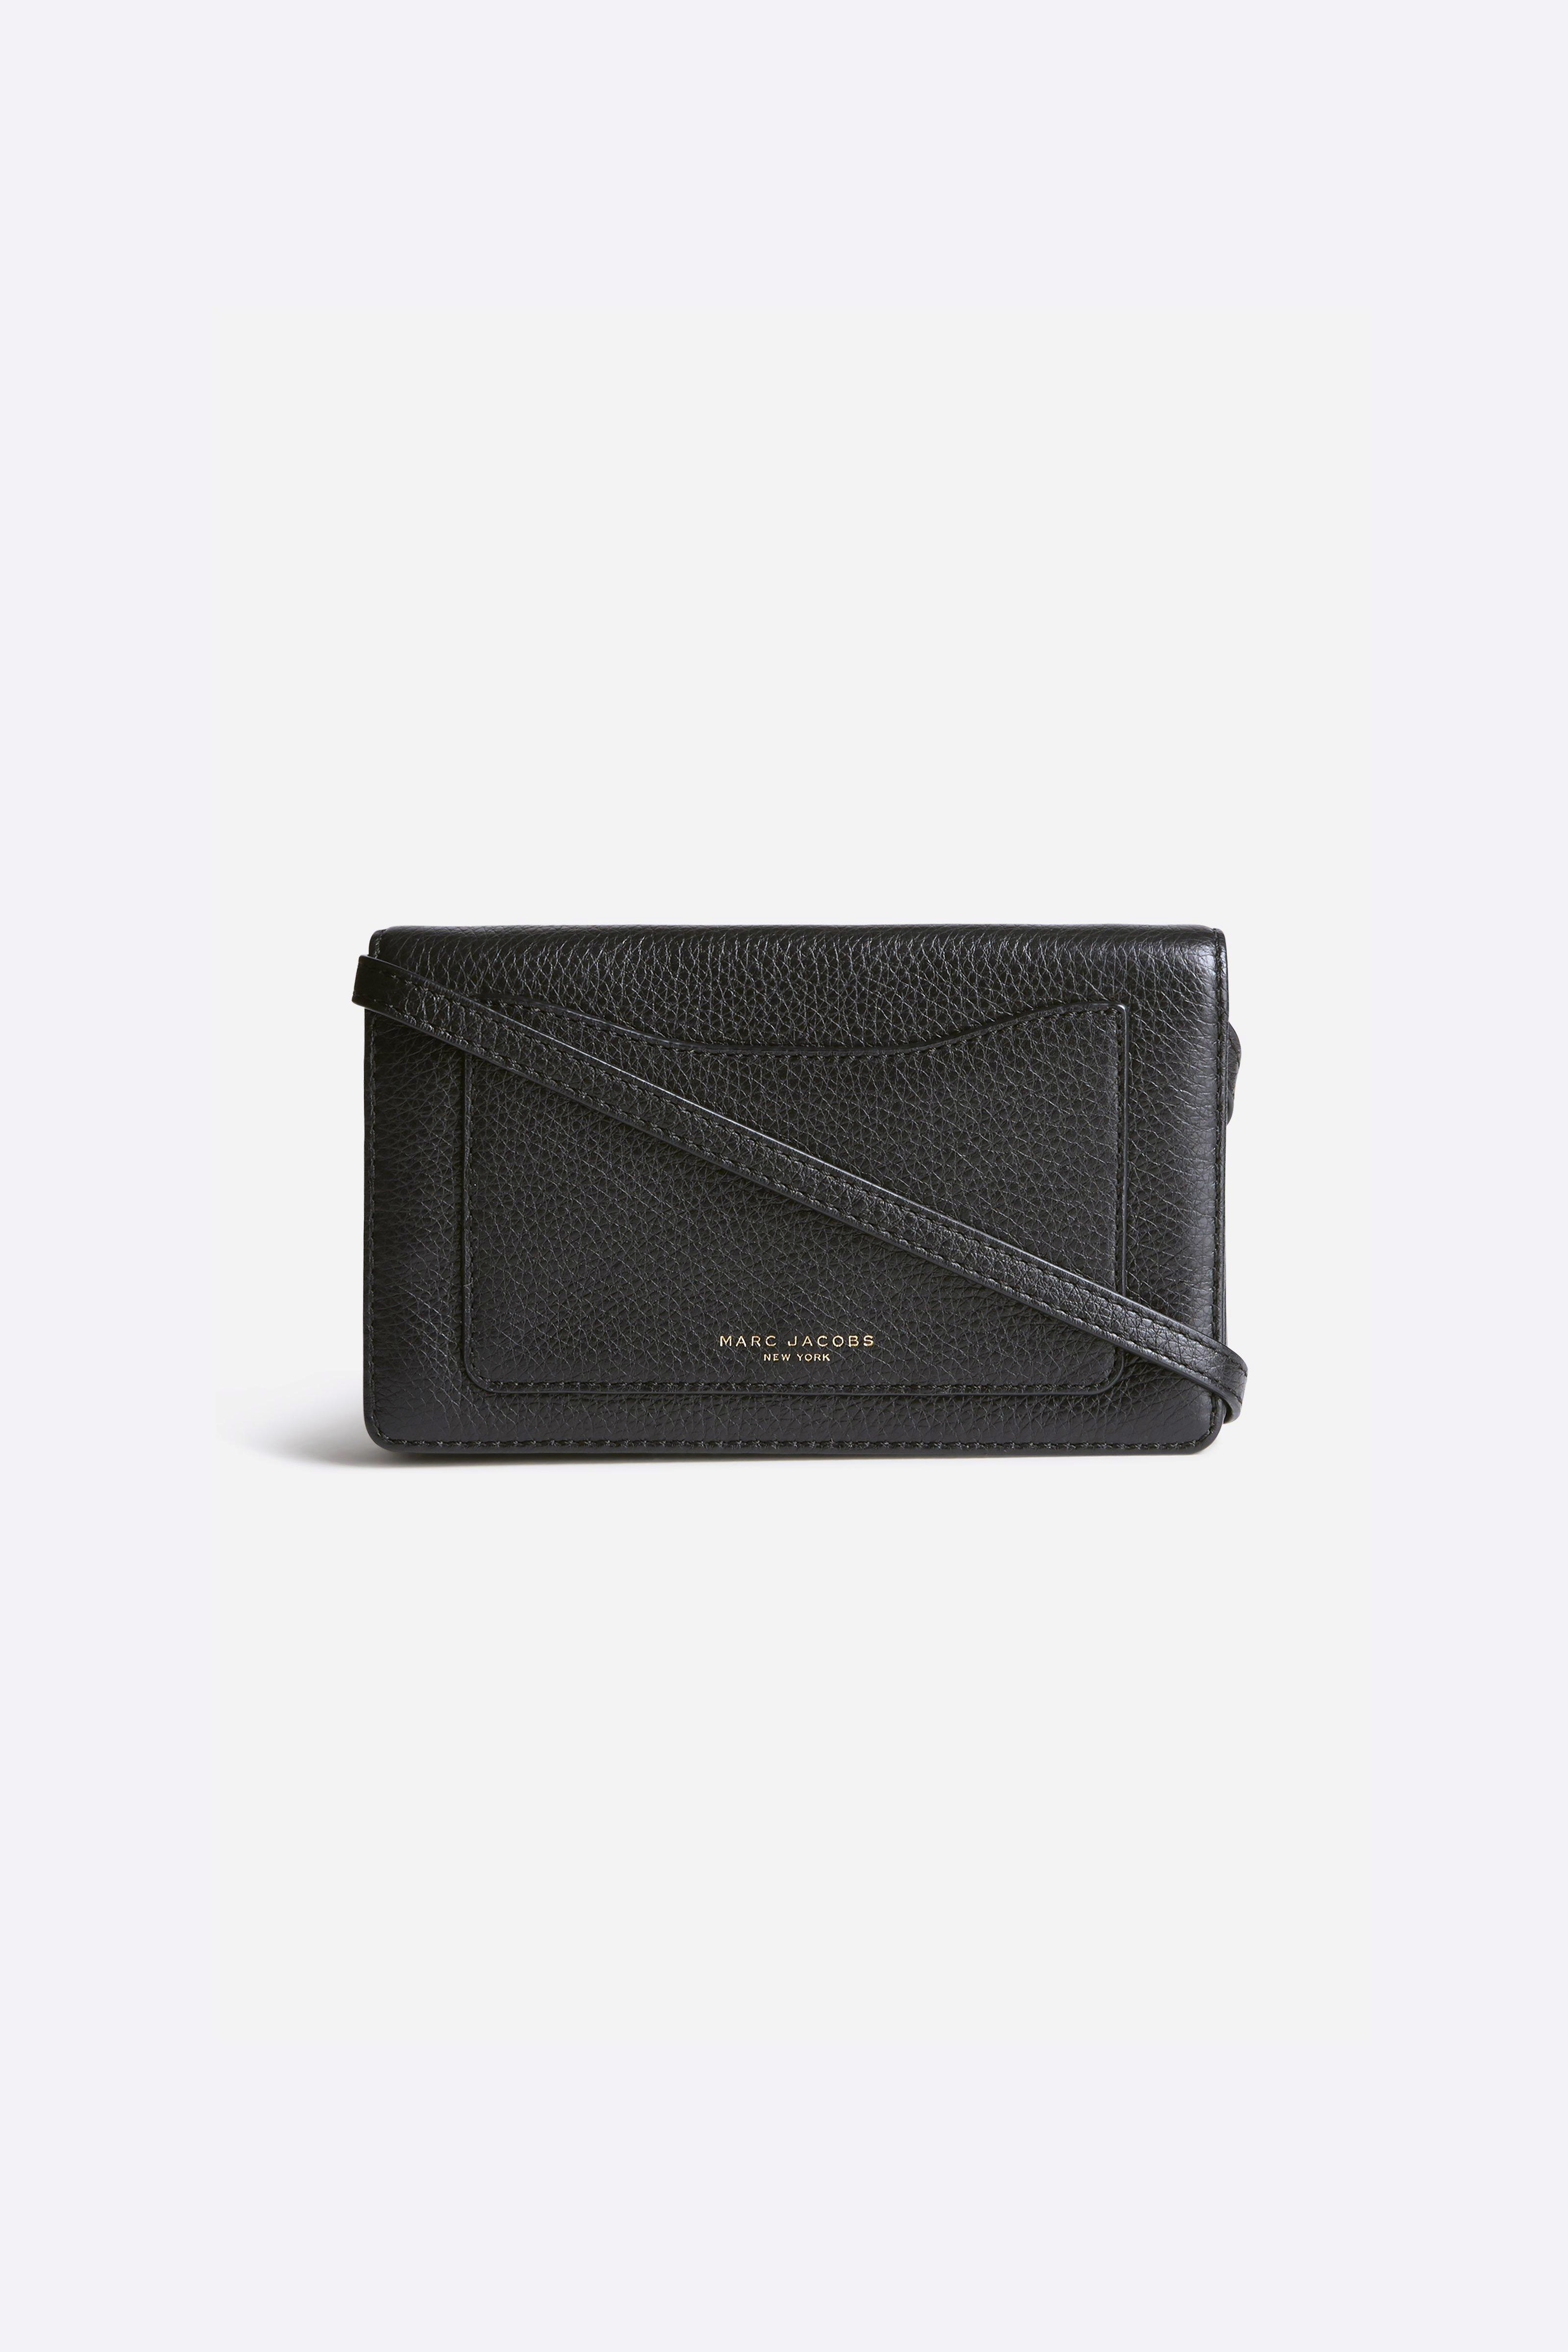 Marc Jacobs 27 - Recruit Wallet Leather Strap - Black